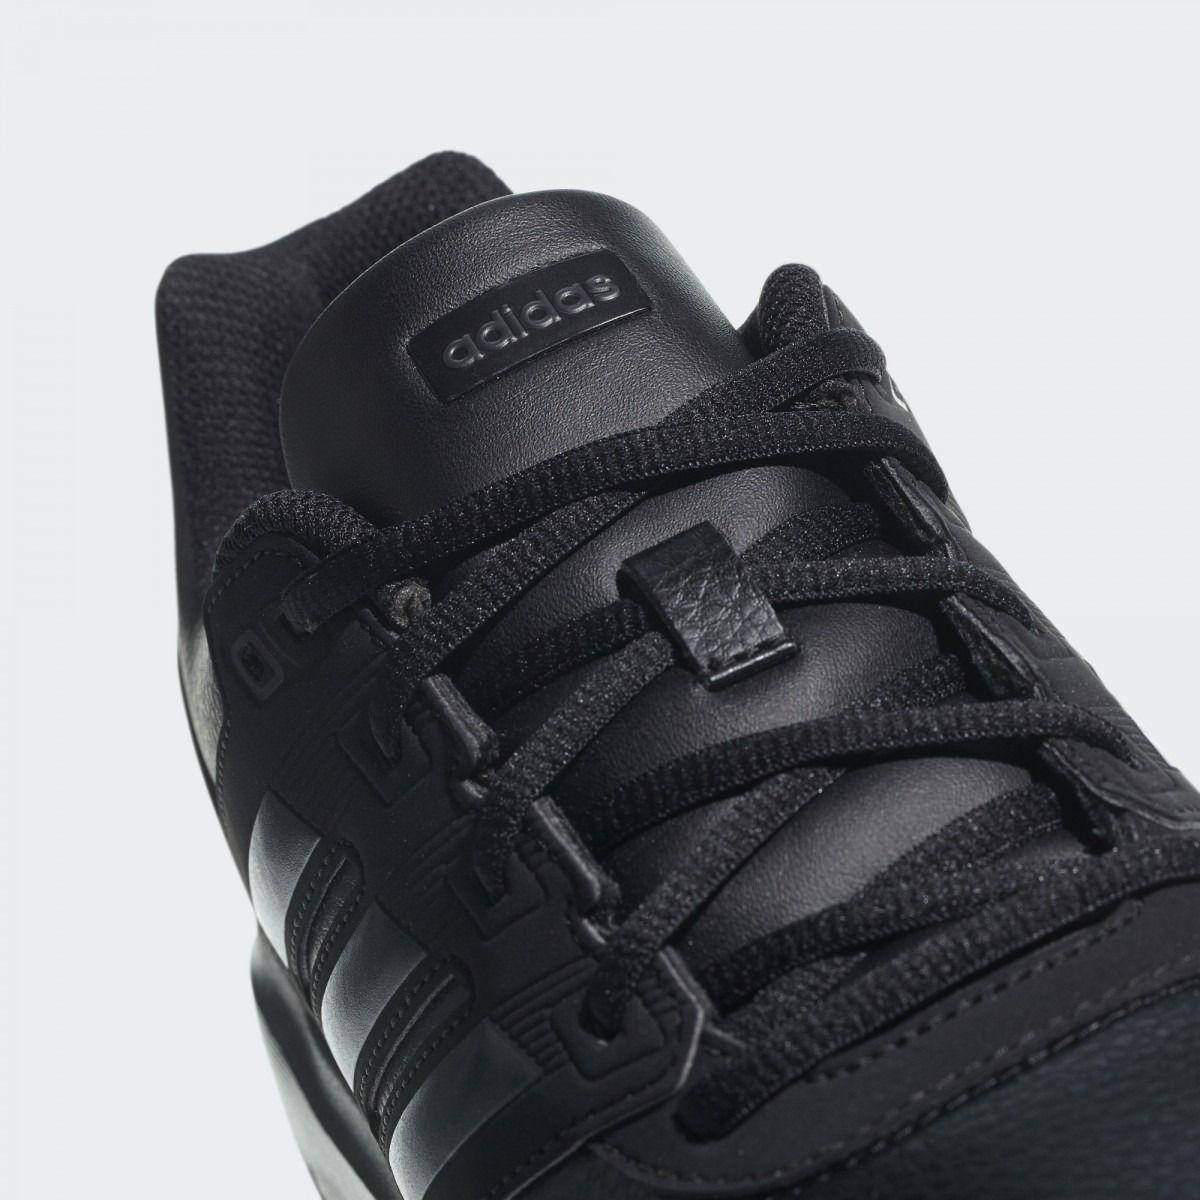 huge discount 5f6f9 0fa50 Tênis Adidas Duramo Lite 2.0 Masculino - Preto R 249,90 à vista. Adicionar  à sacola